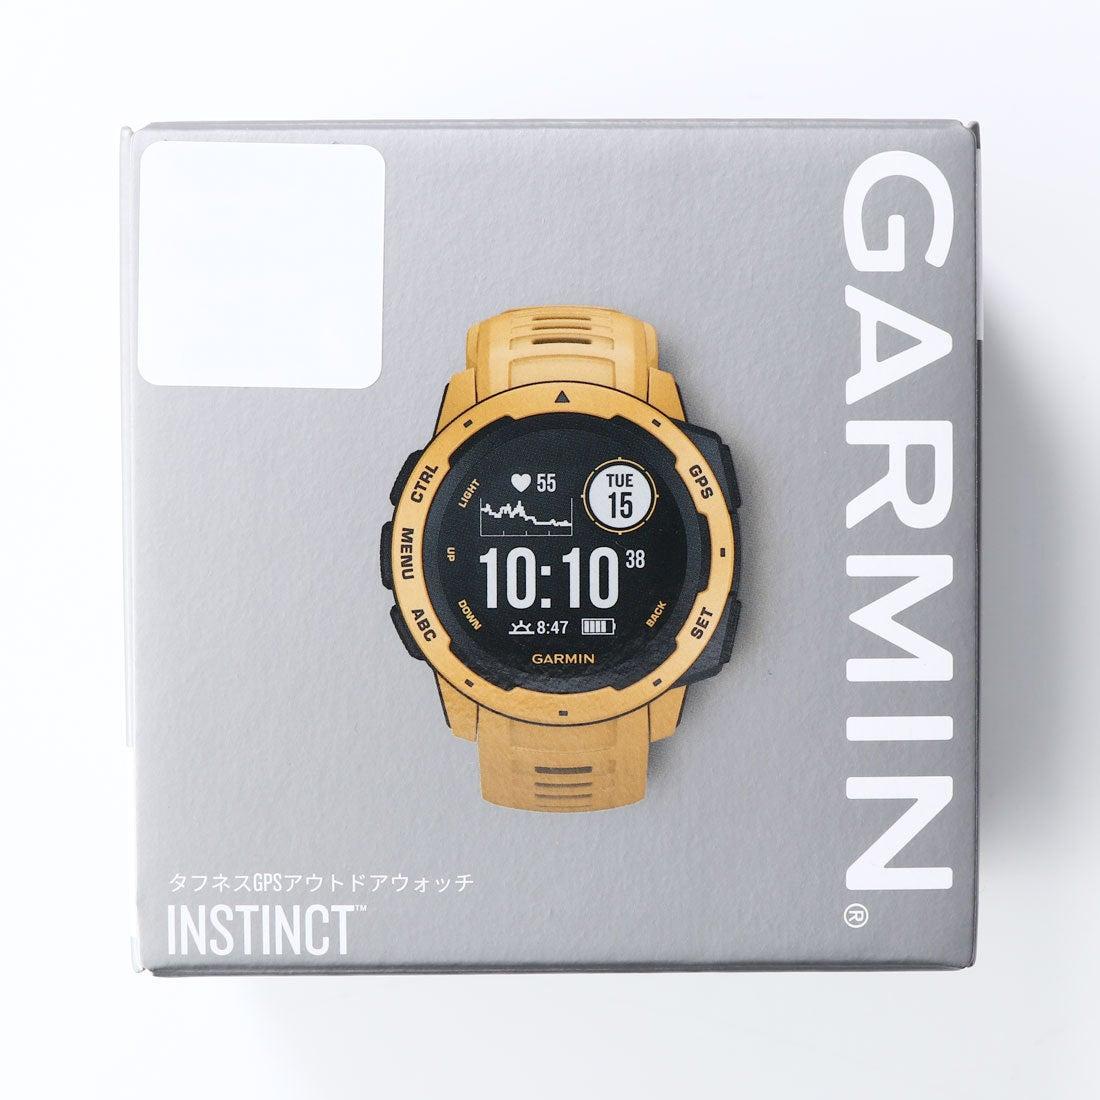 cac0562548 ガーミン GARMIN 陸上/ランニング 時計 Instinct Sunburst 0100206442 7167 -レディースファッション通販  ロコンドガールズコレクション (LOCONDO GIRL'S COLLECTION)